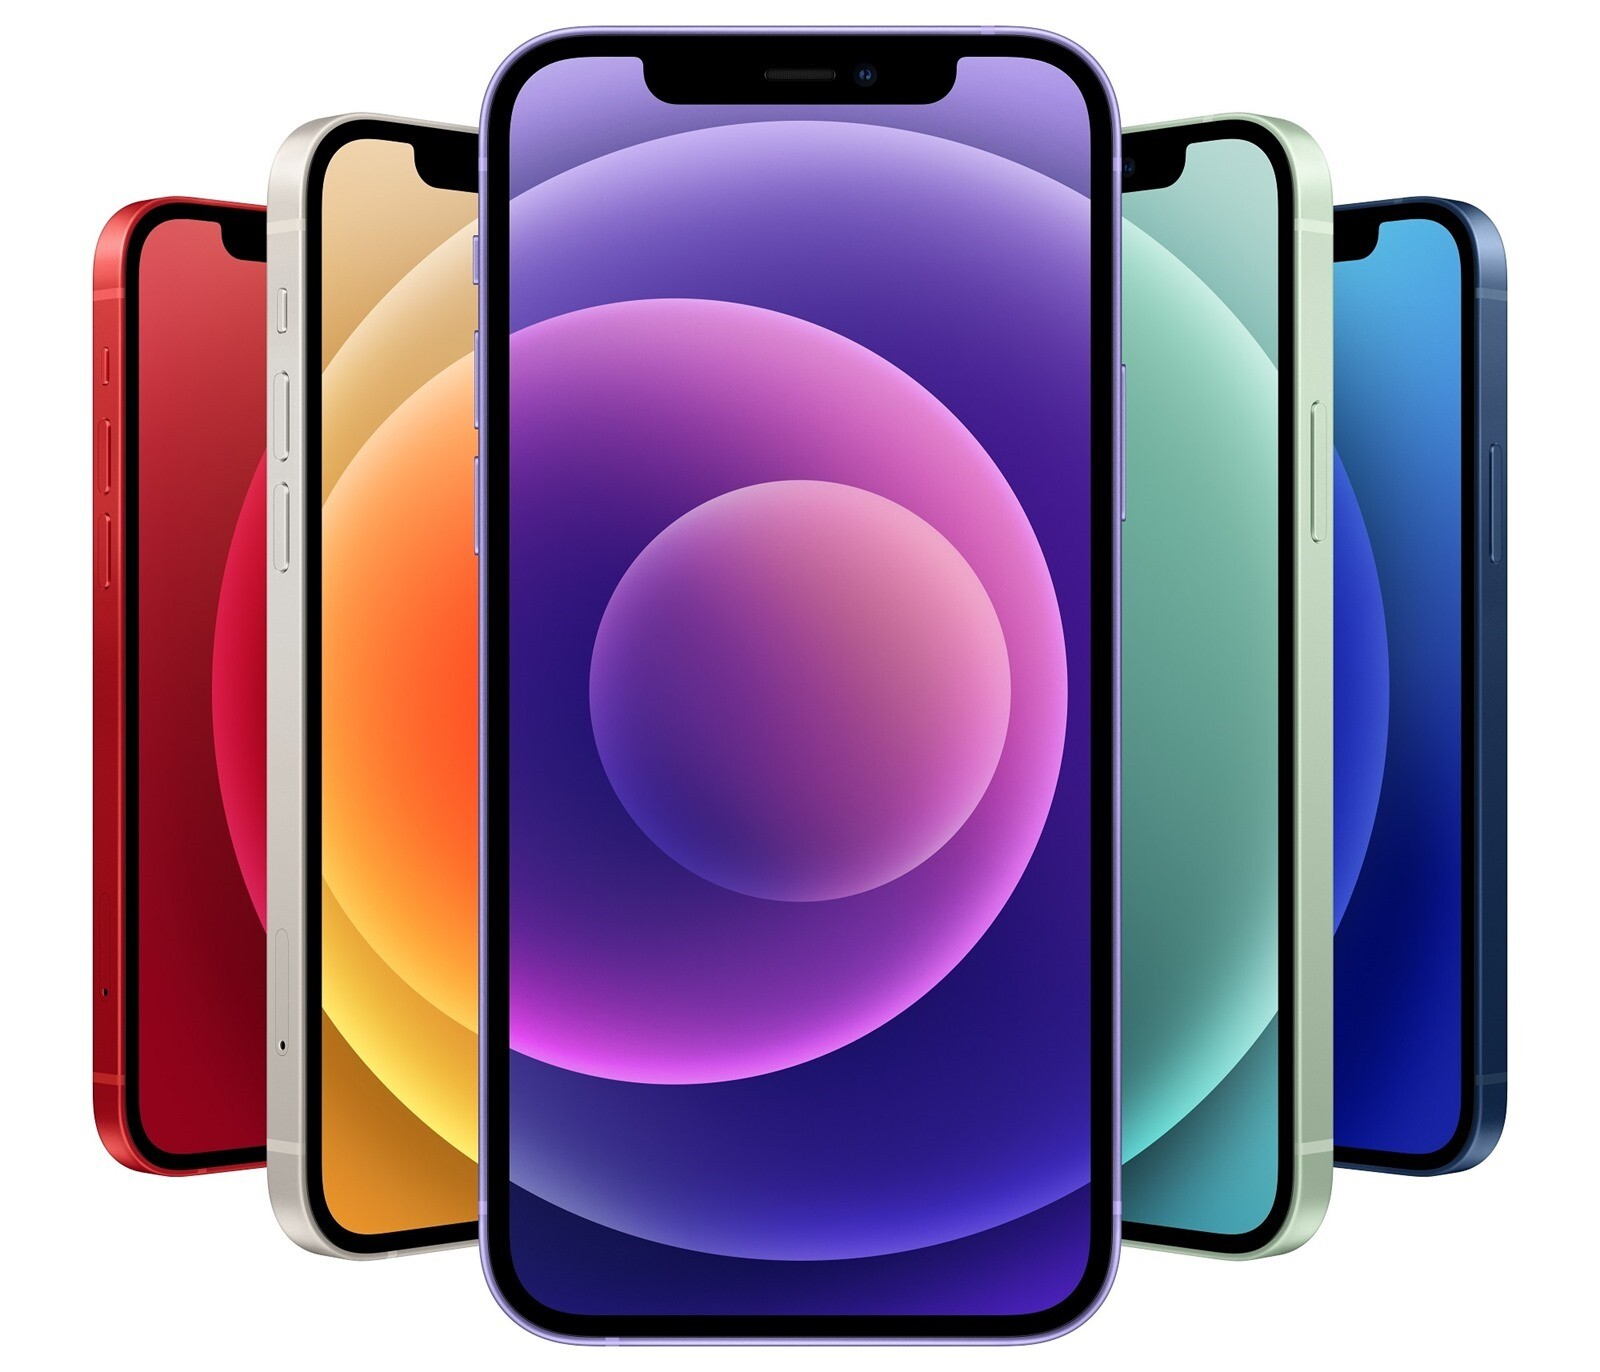 【PChome-24h 購物】iPhone-12/-iPhone-12-mini_thumb.jpg @3C 達人廖阿輝